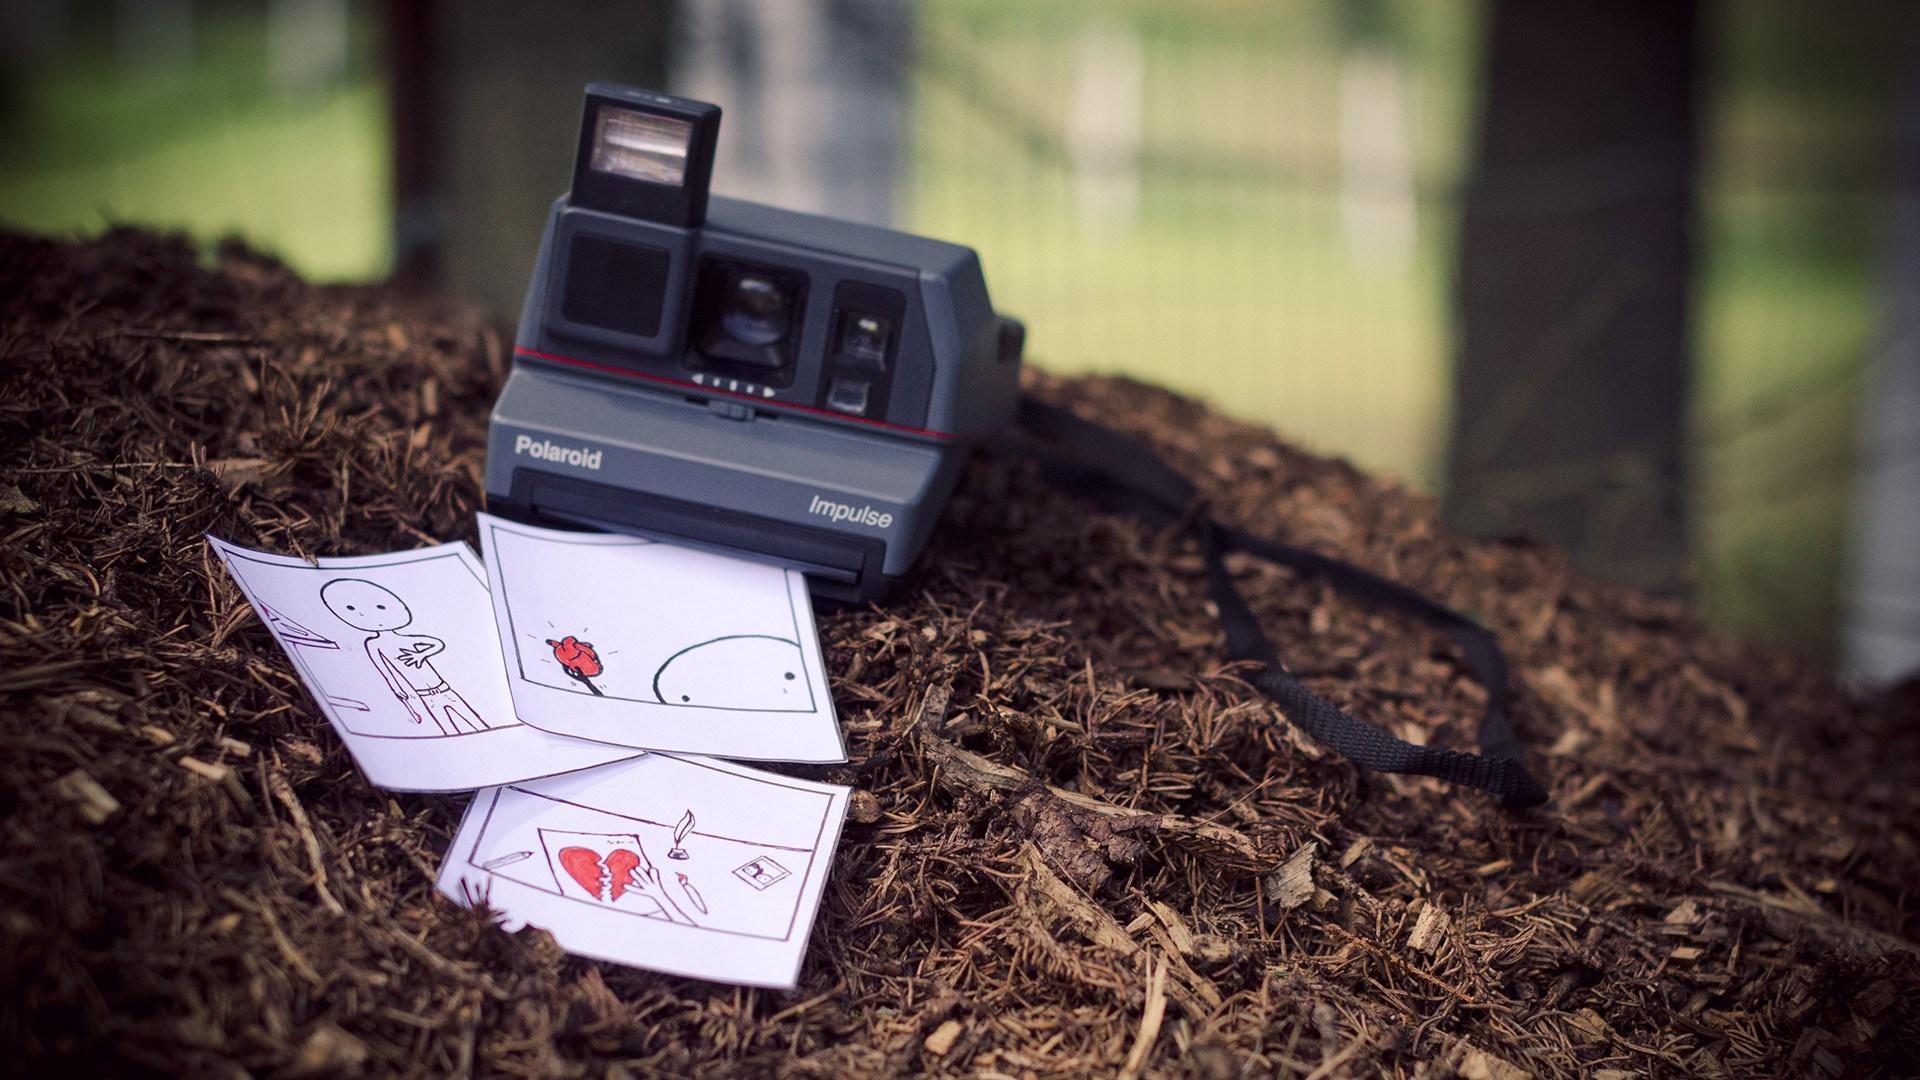 img 1388333457 149 اجدد صور قلوب حب للتصميم , صور خلفيات قلوب رومانتيك